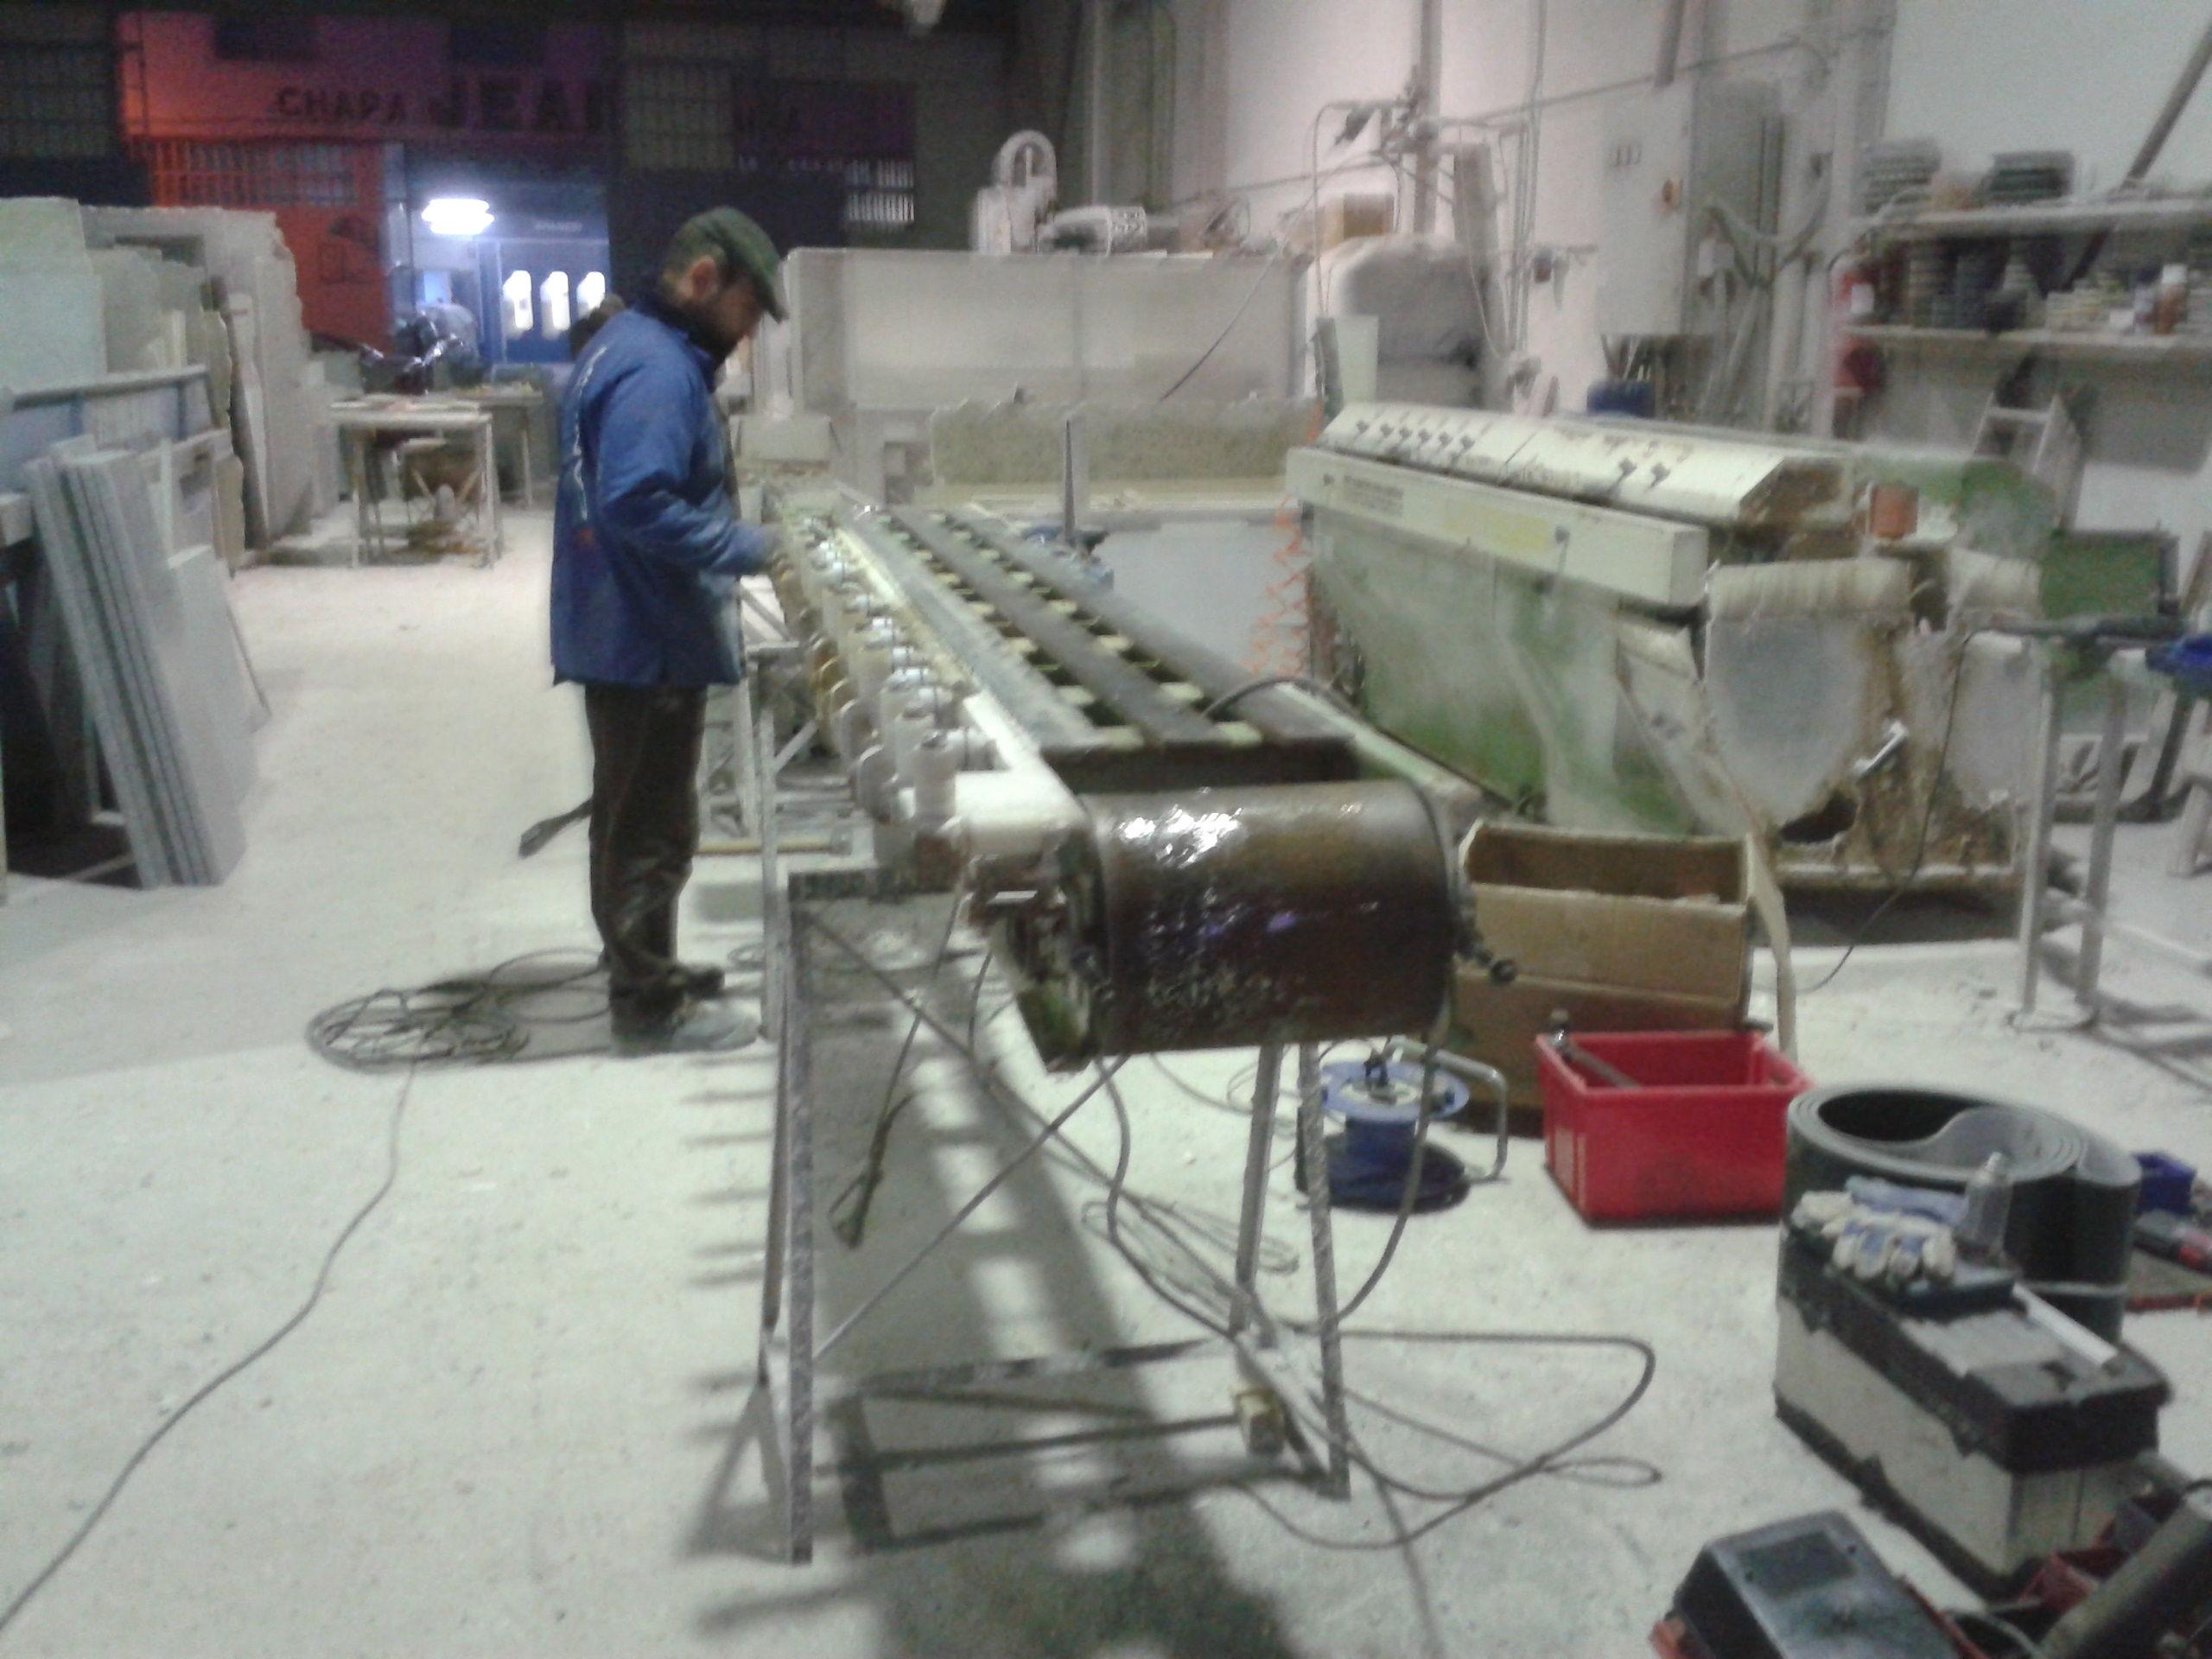 Pulecantos Marmo Meccanique